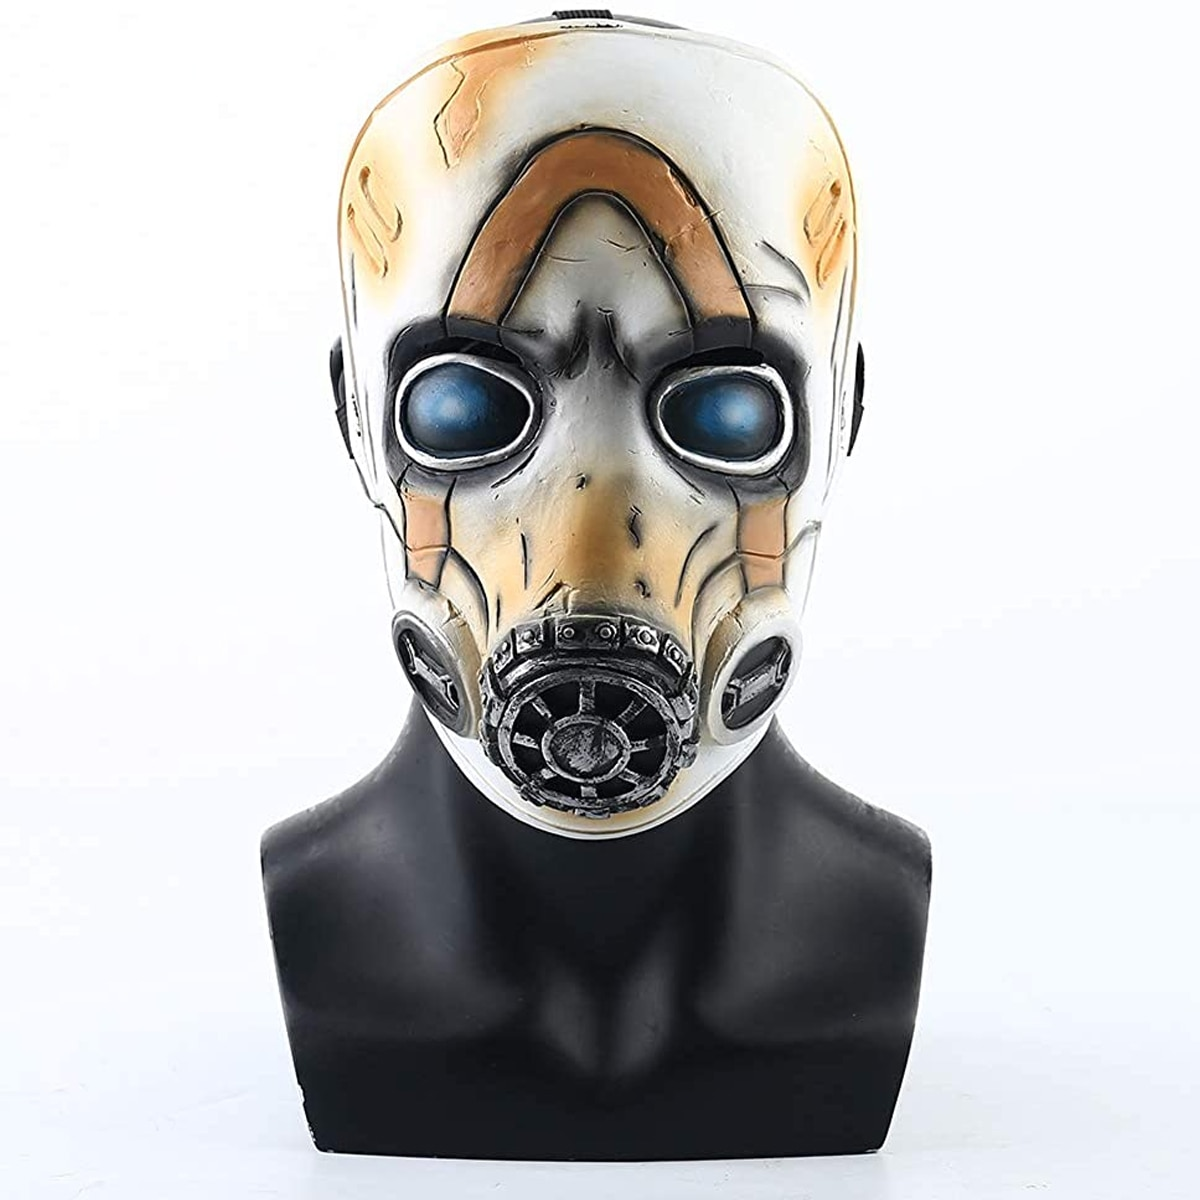 Juego Krieg Borderlands 3 Psycho LED Luz de látex, máscaras casco de cabeza completa Borderlands, disfraz de Cosplay, accesorios de fiesta de Halloween ATERRADOR